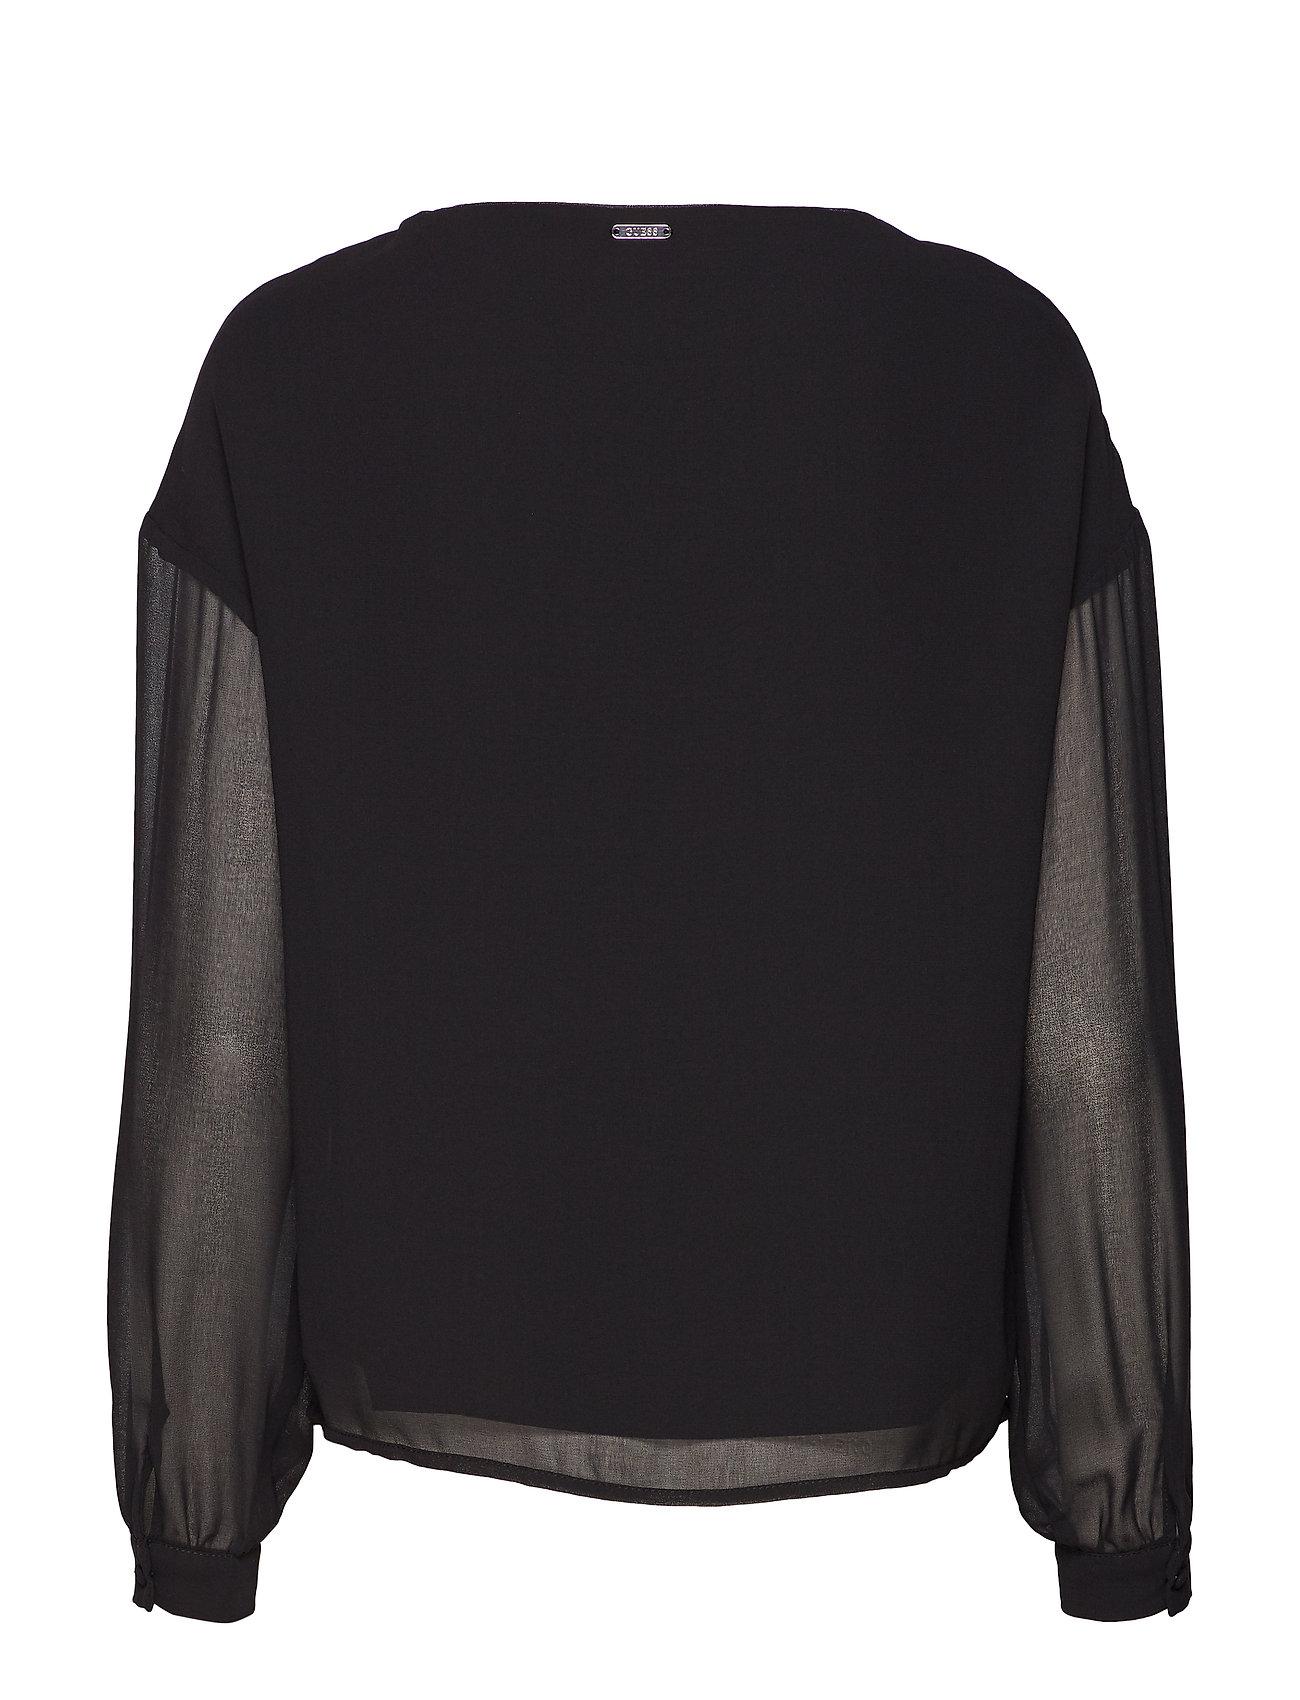 Topjet Yasmine Black A996Guess Ls Jeans kuOZiTPX